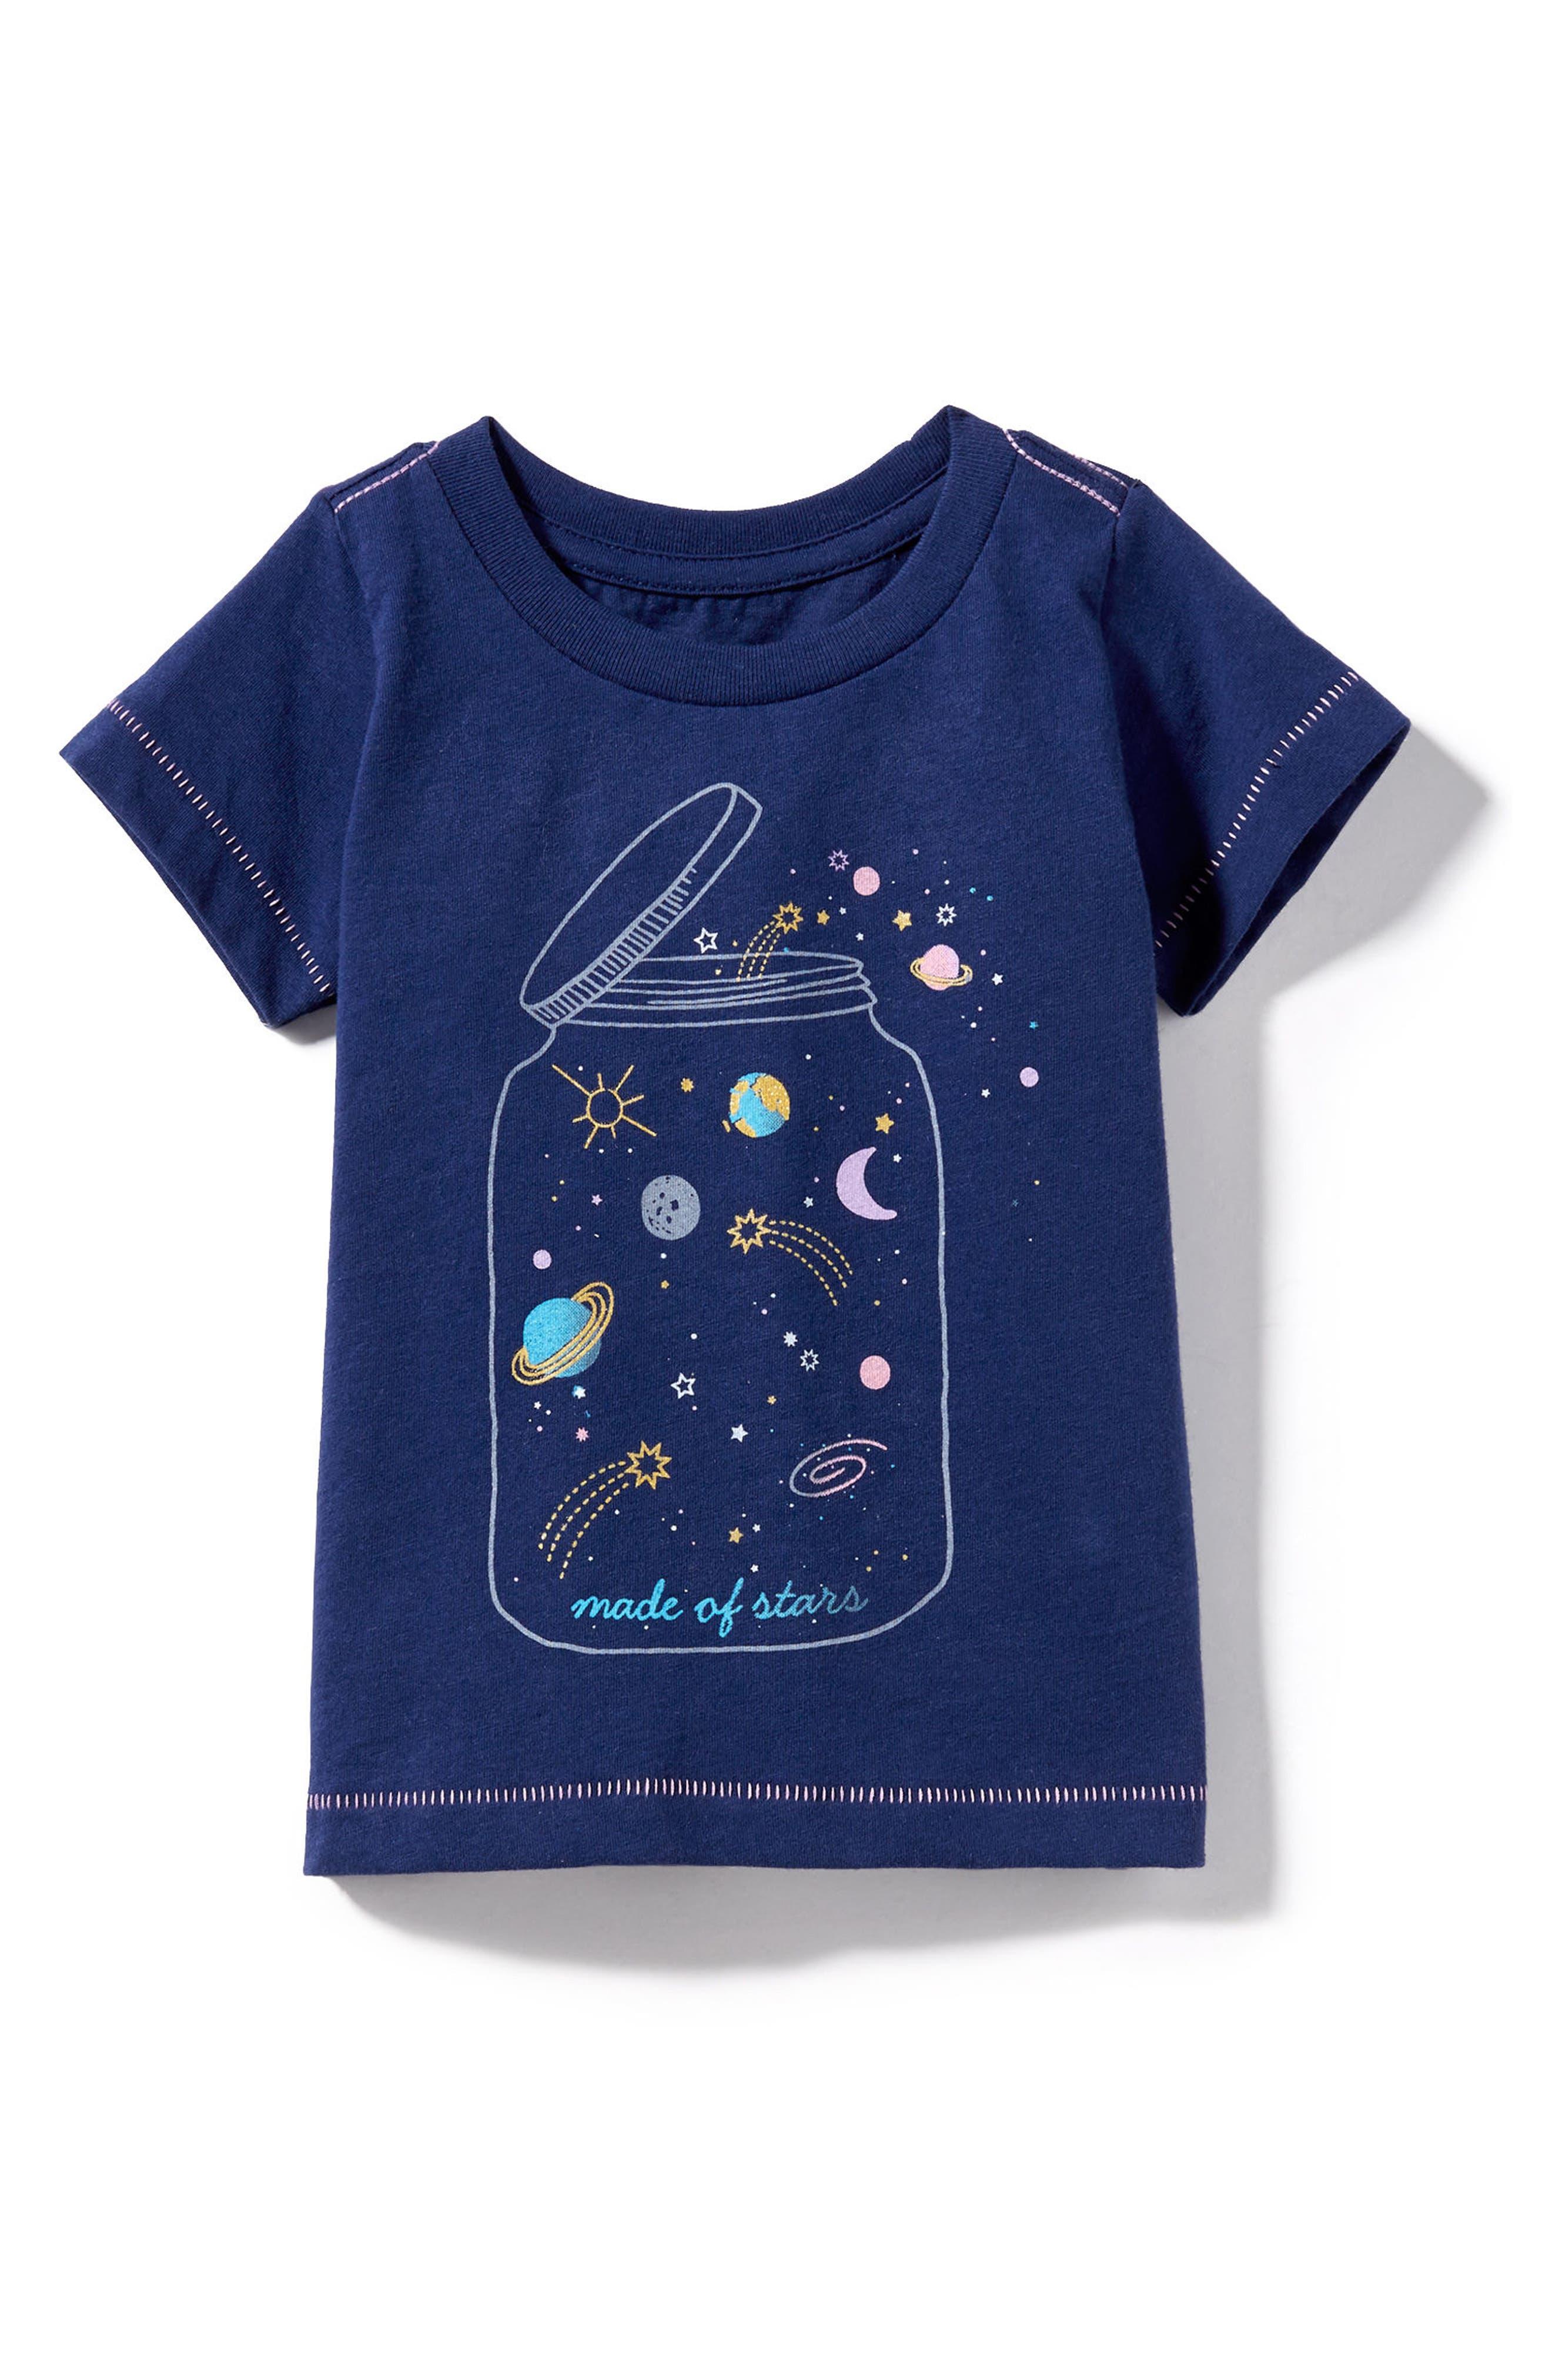 Jar of Stars Graphic Tee,                             Alternate thumbnail 3, color,                             410